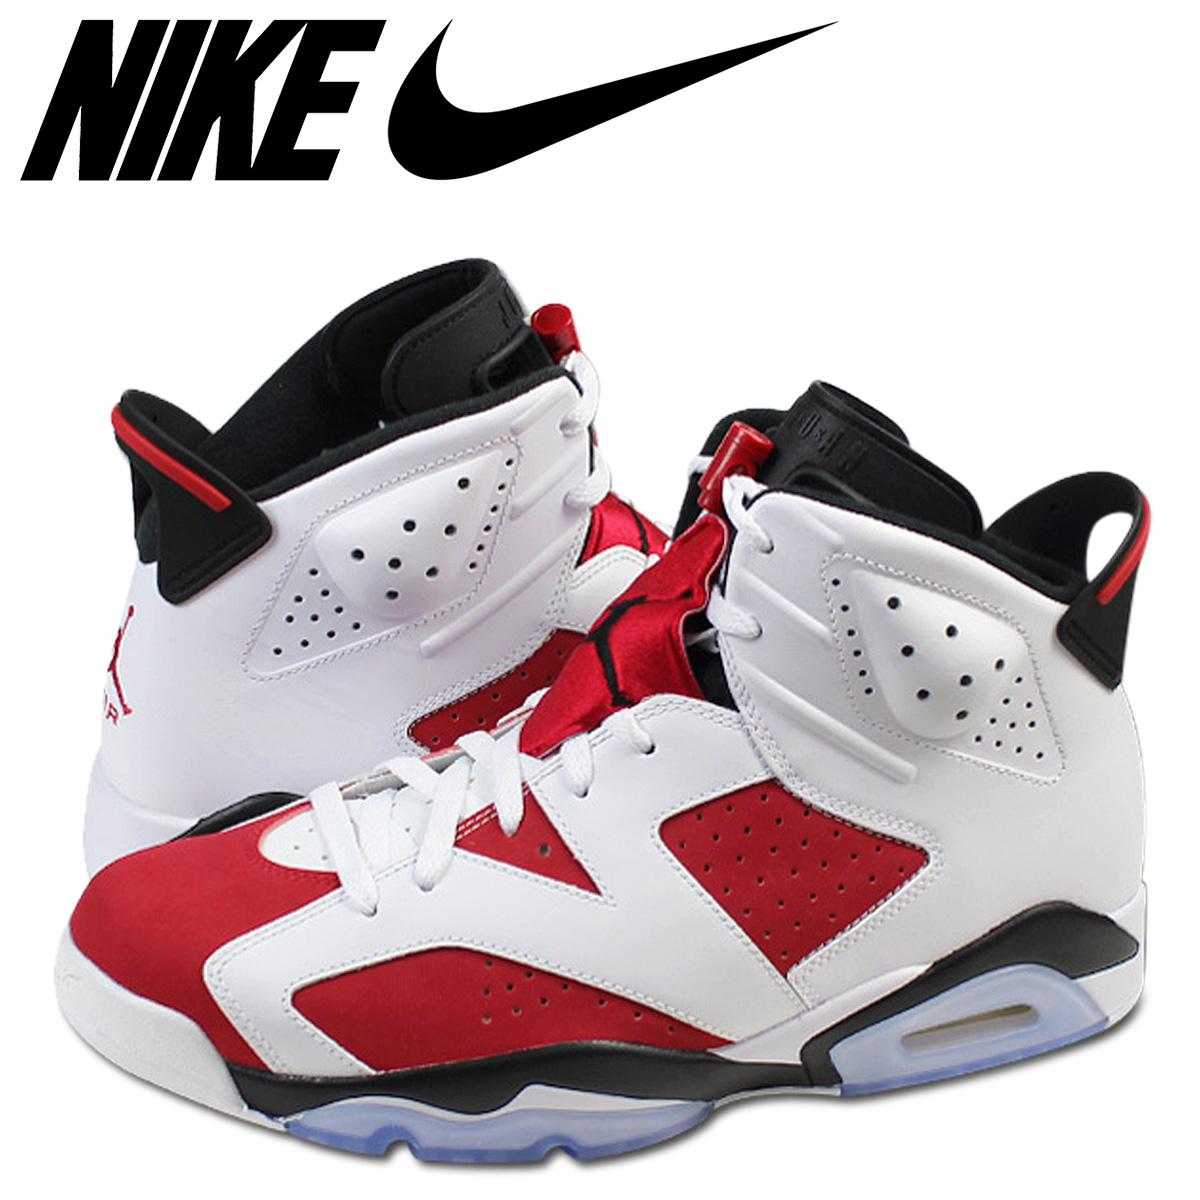 innovative design 4c9ba 95bbb Nike NIKE Air Jordan sneakers AIR JORDAN 6 RETRO CARMINE Air Jordan 6  nostalgic carmine 384,664 ...